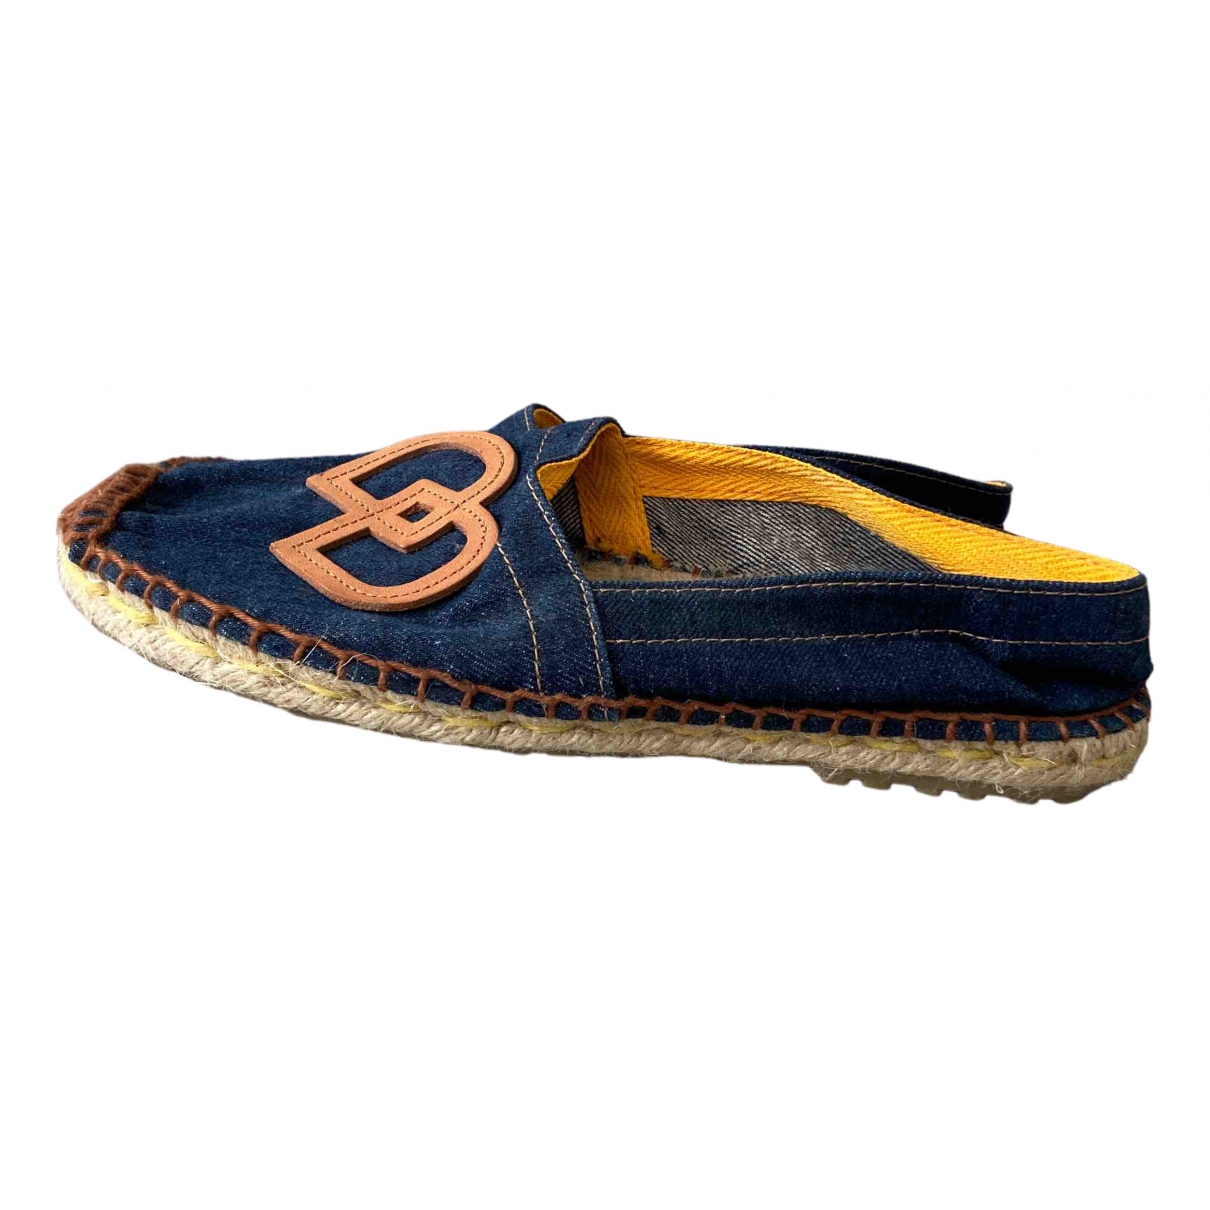 Dsquared2 \N Espadrilles in  Blau Denim - Jeans